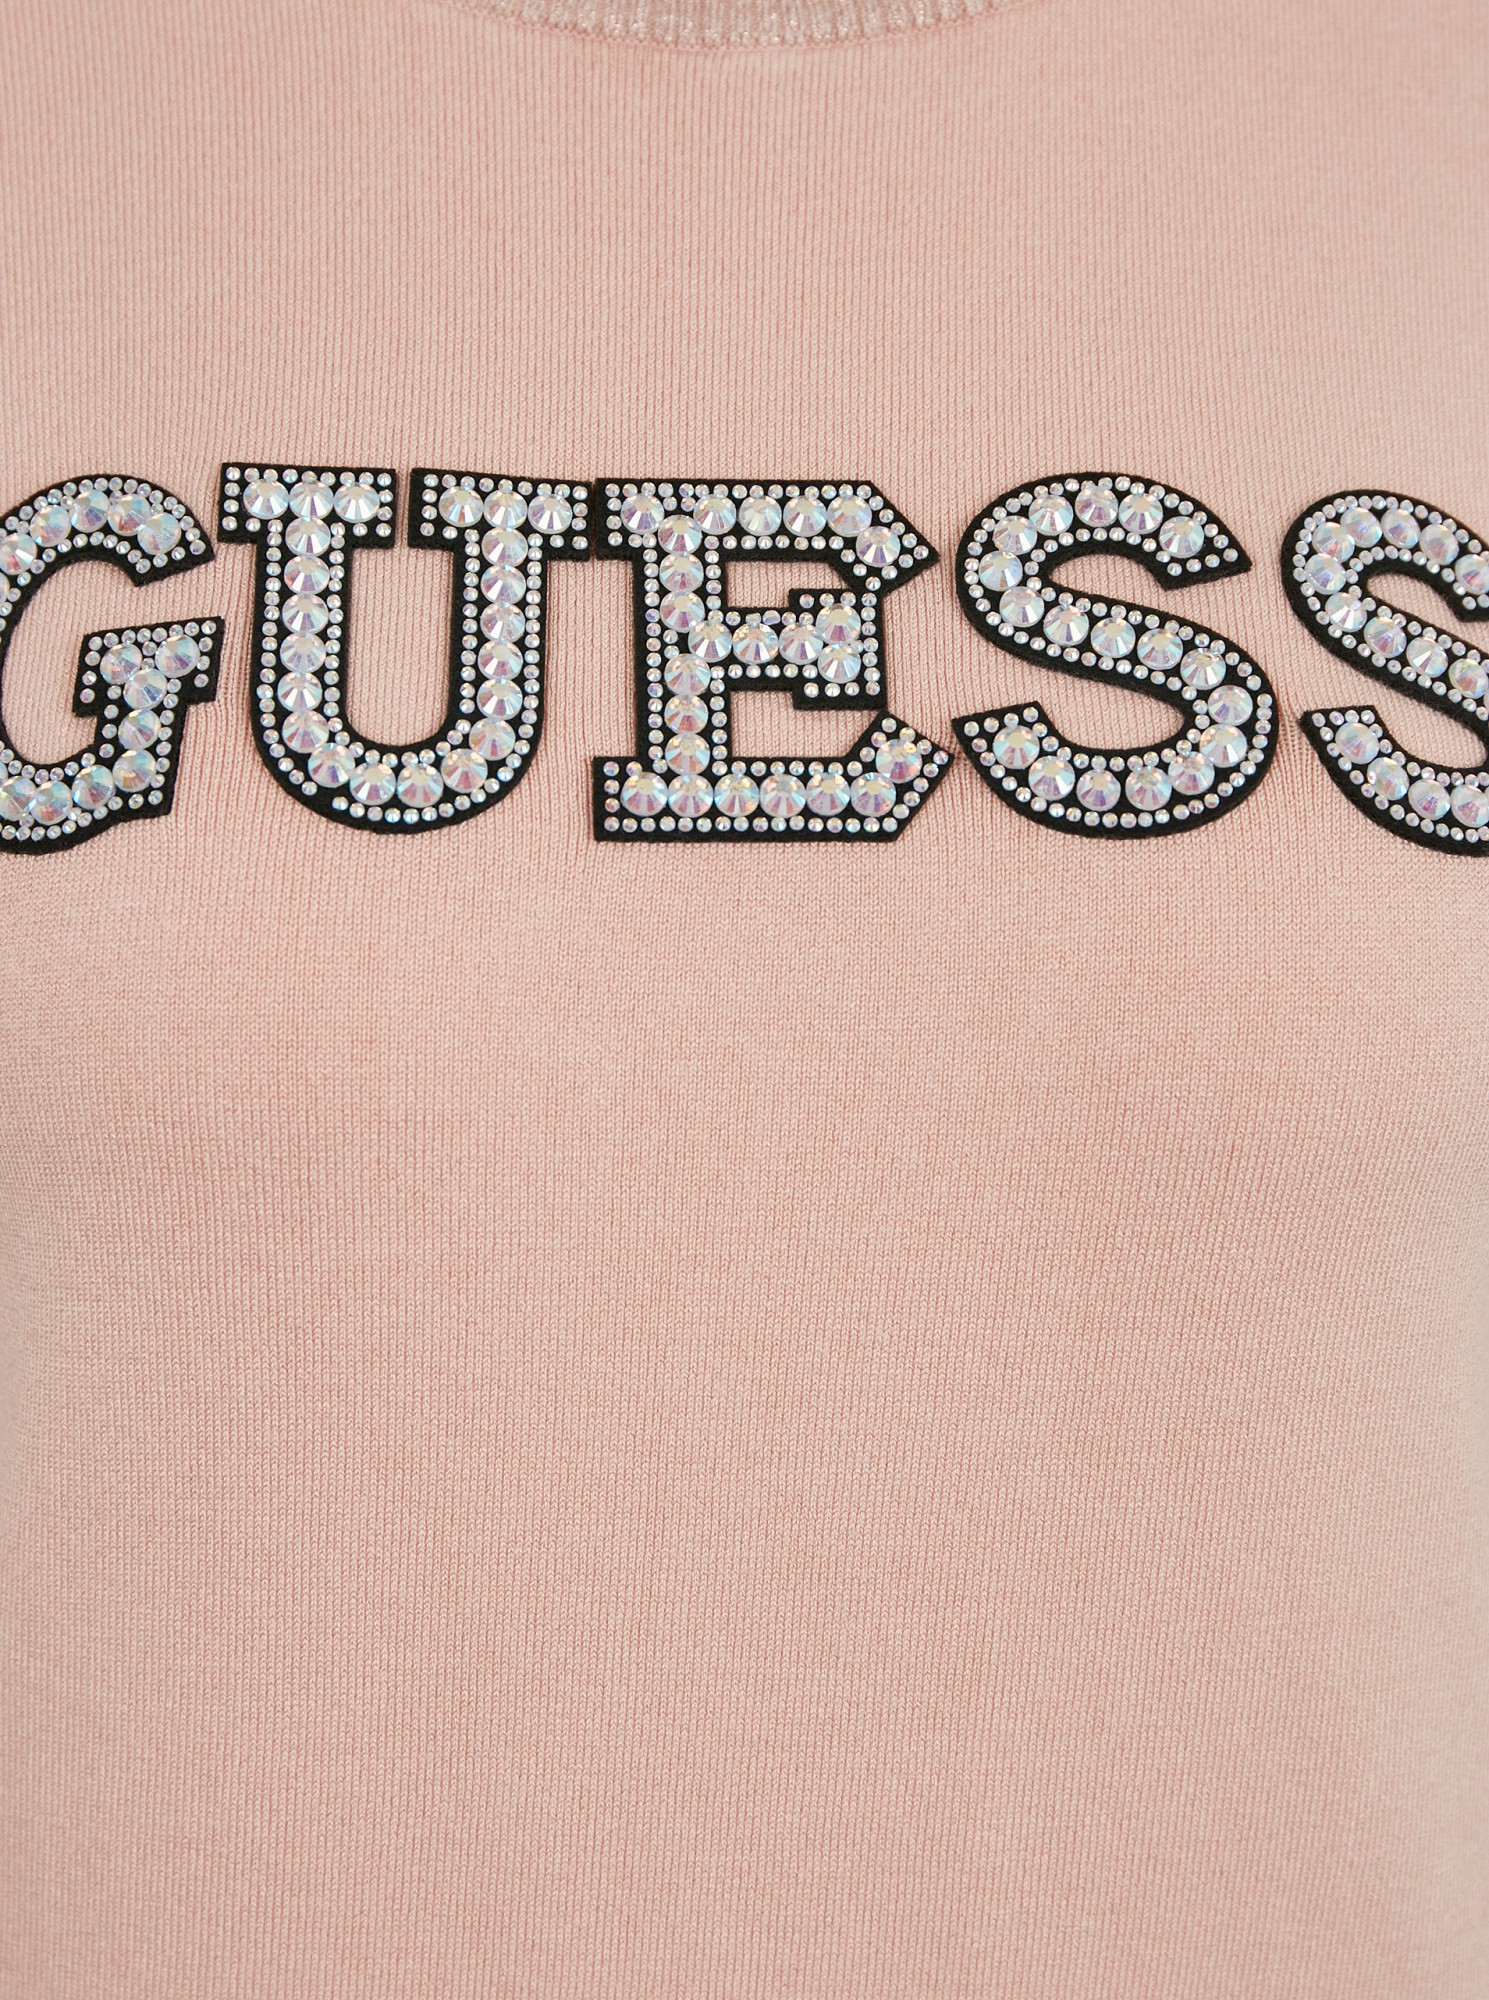 Guess powdery T-shirt Guess Clarisse